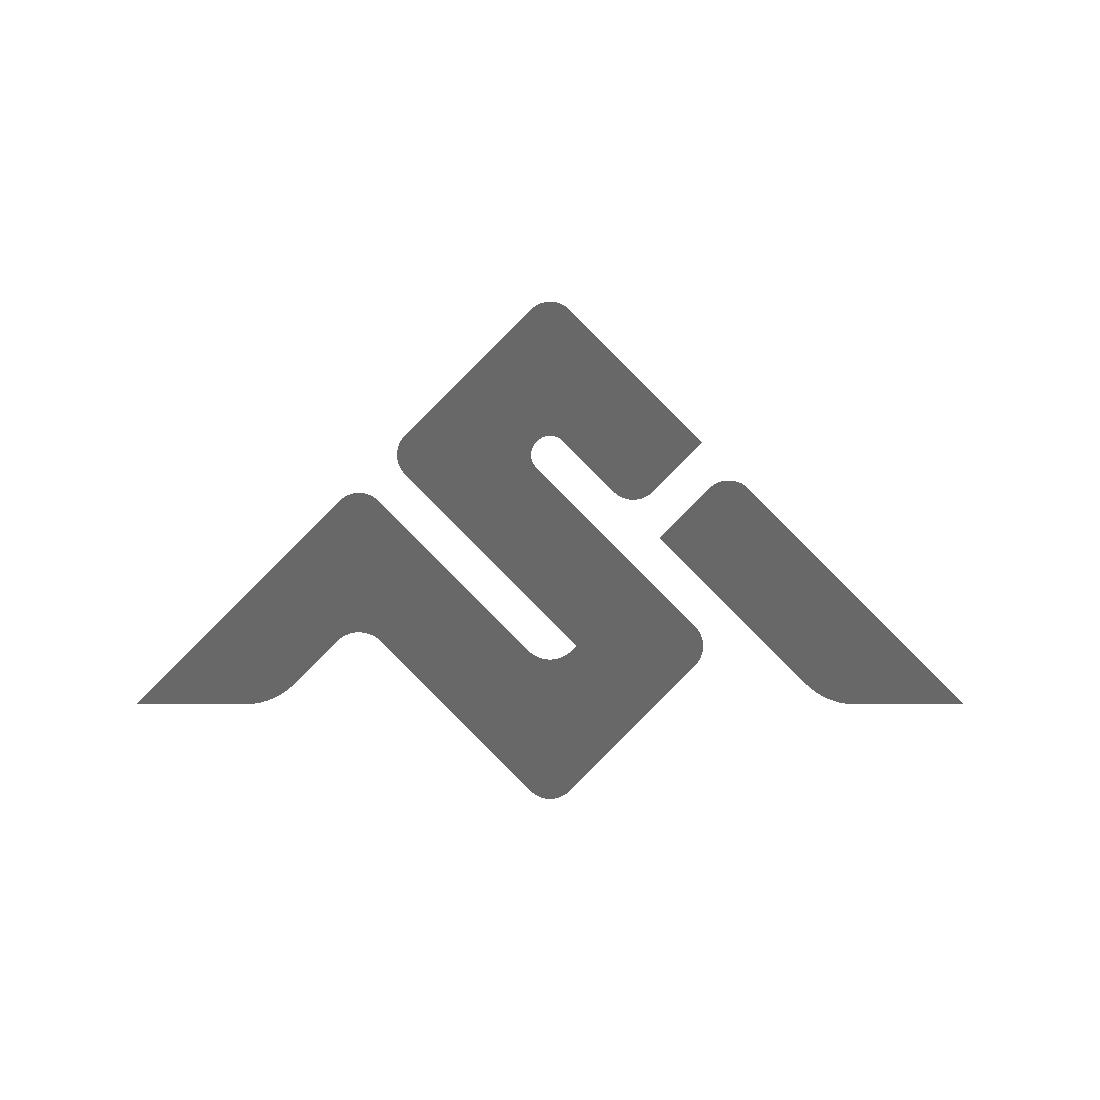 Chaussure de ski de fond Salomon RS8 Prolink Vitane skating